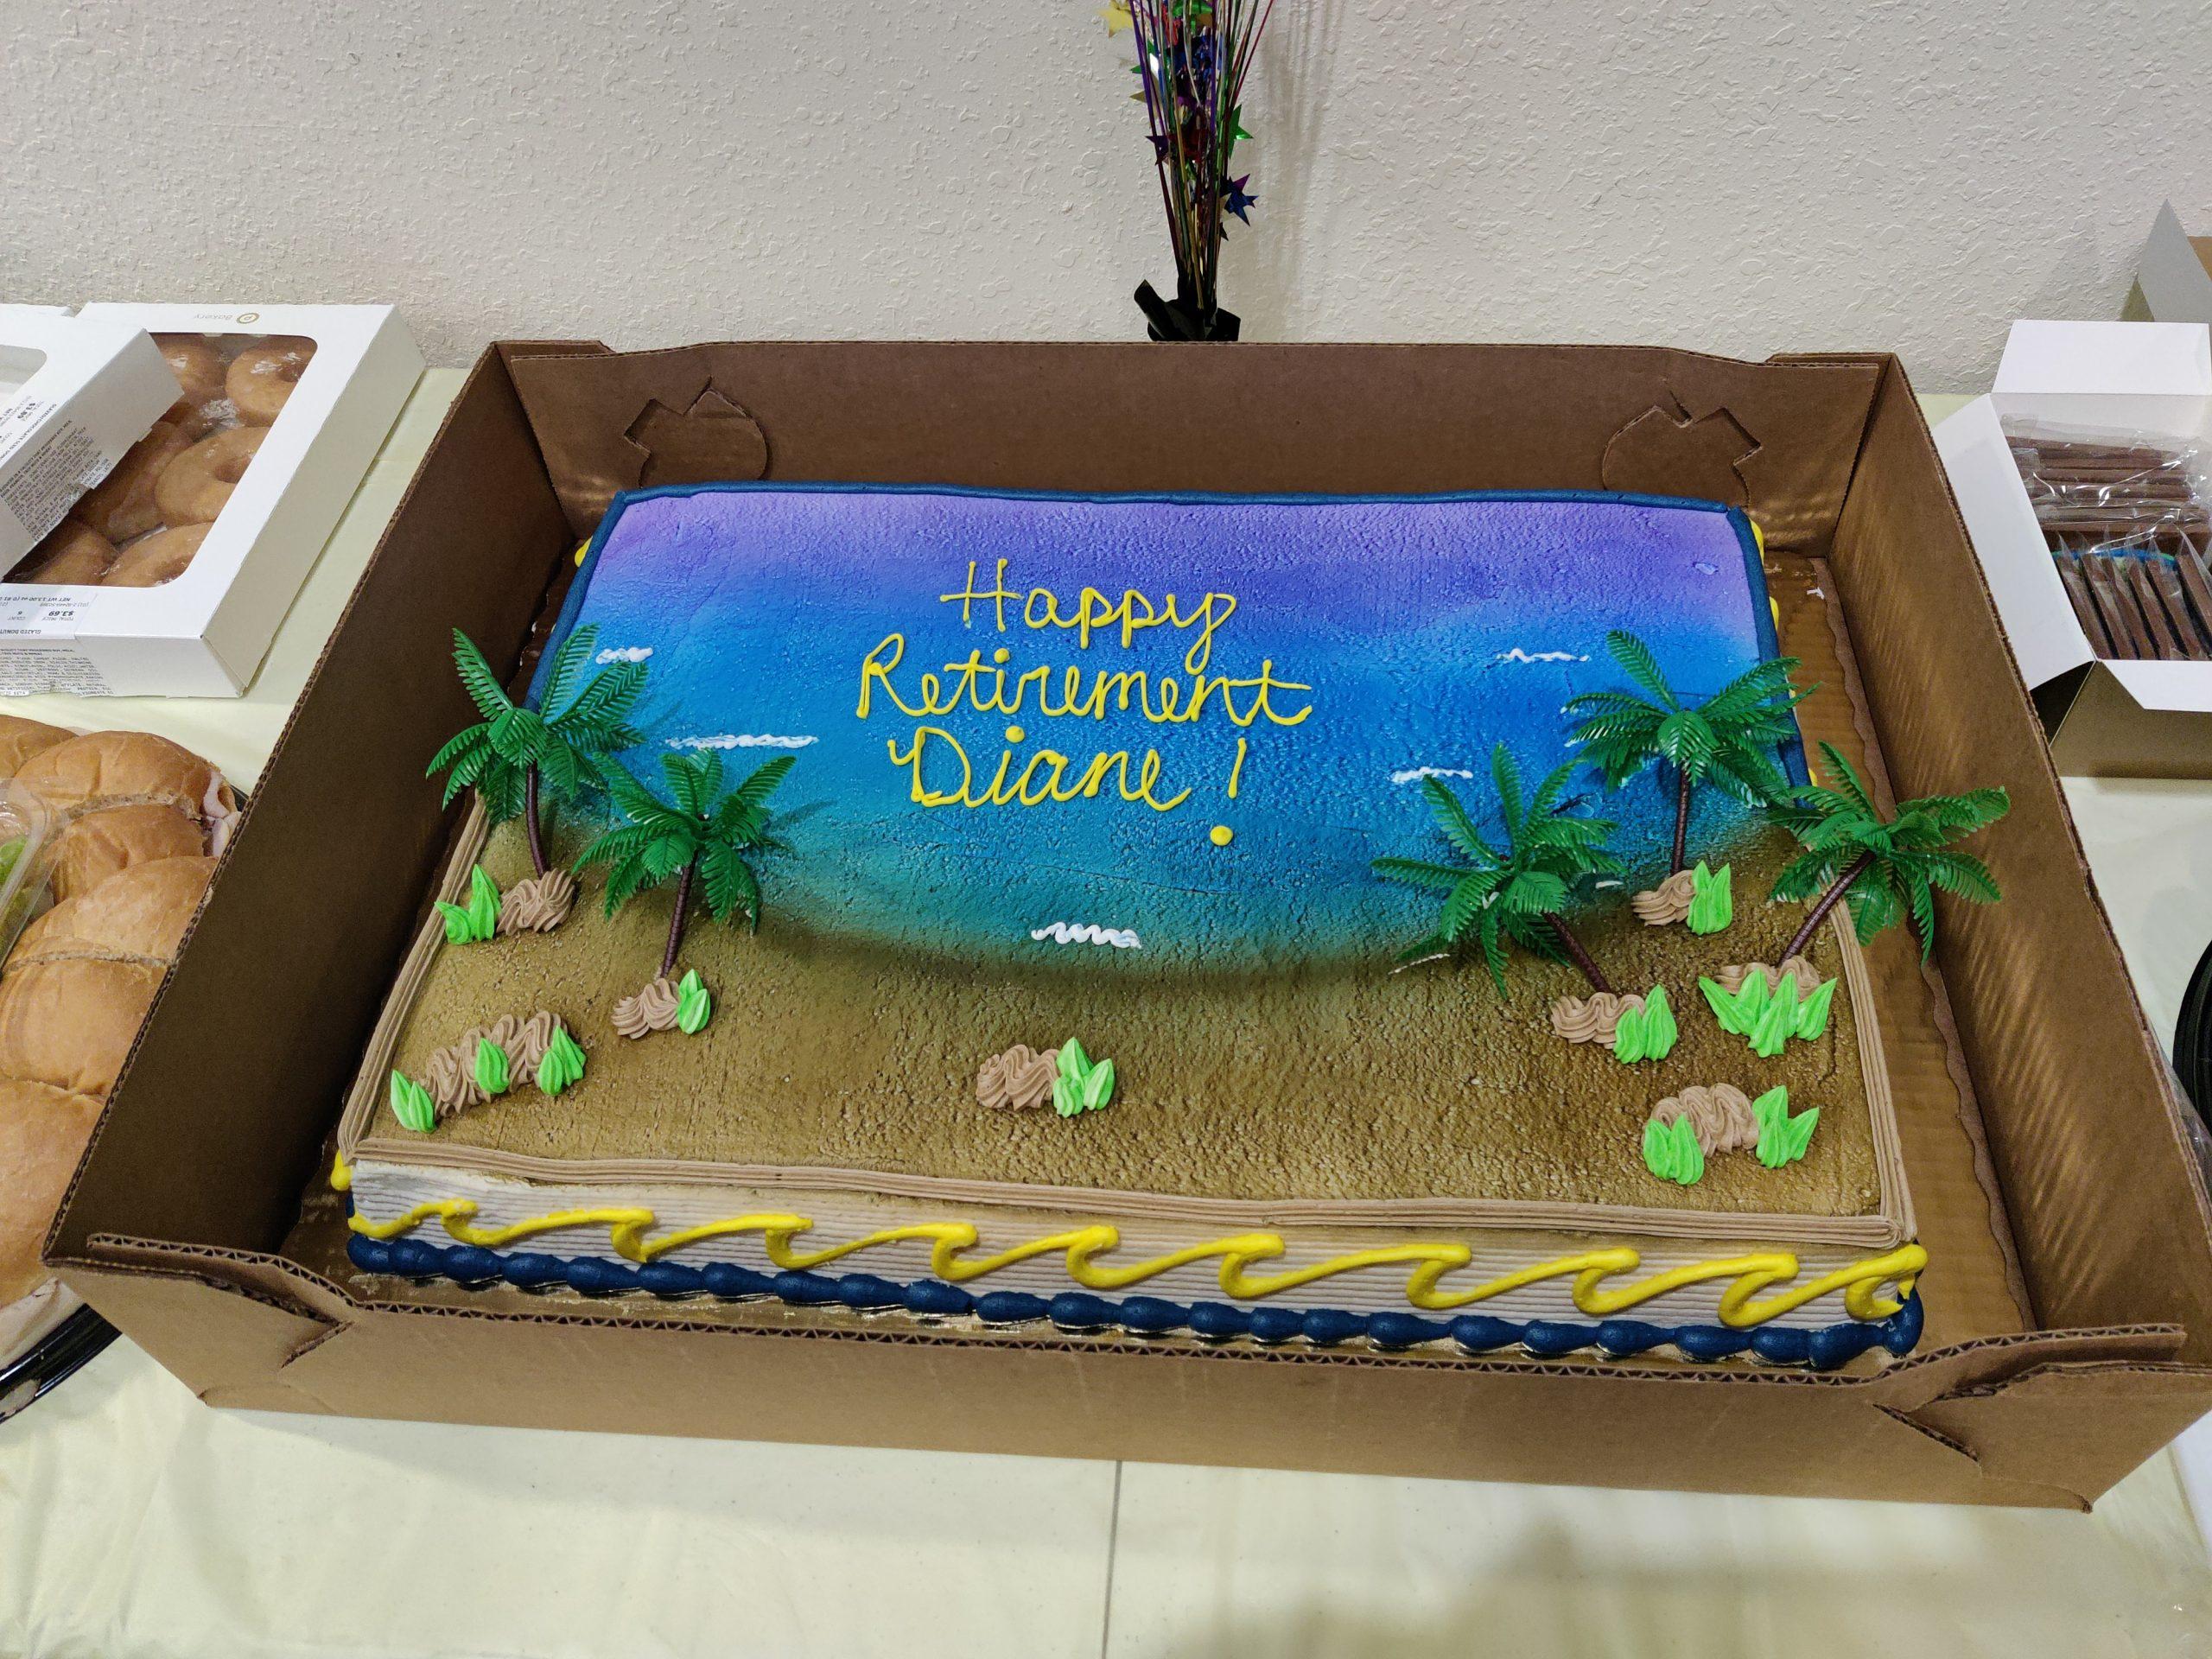 07-09-2021 Diane's Retirement Cake